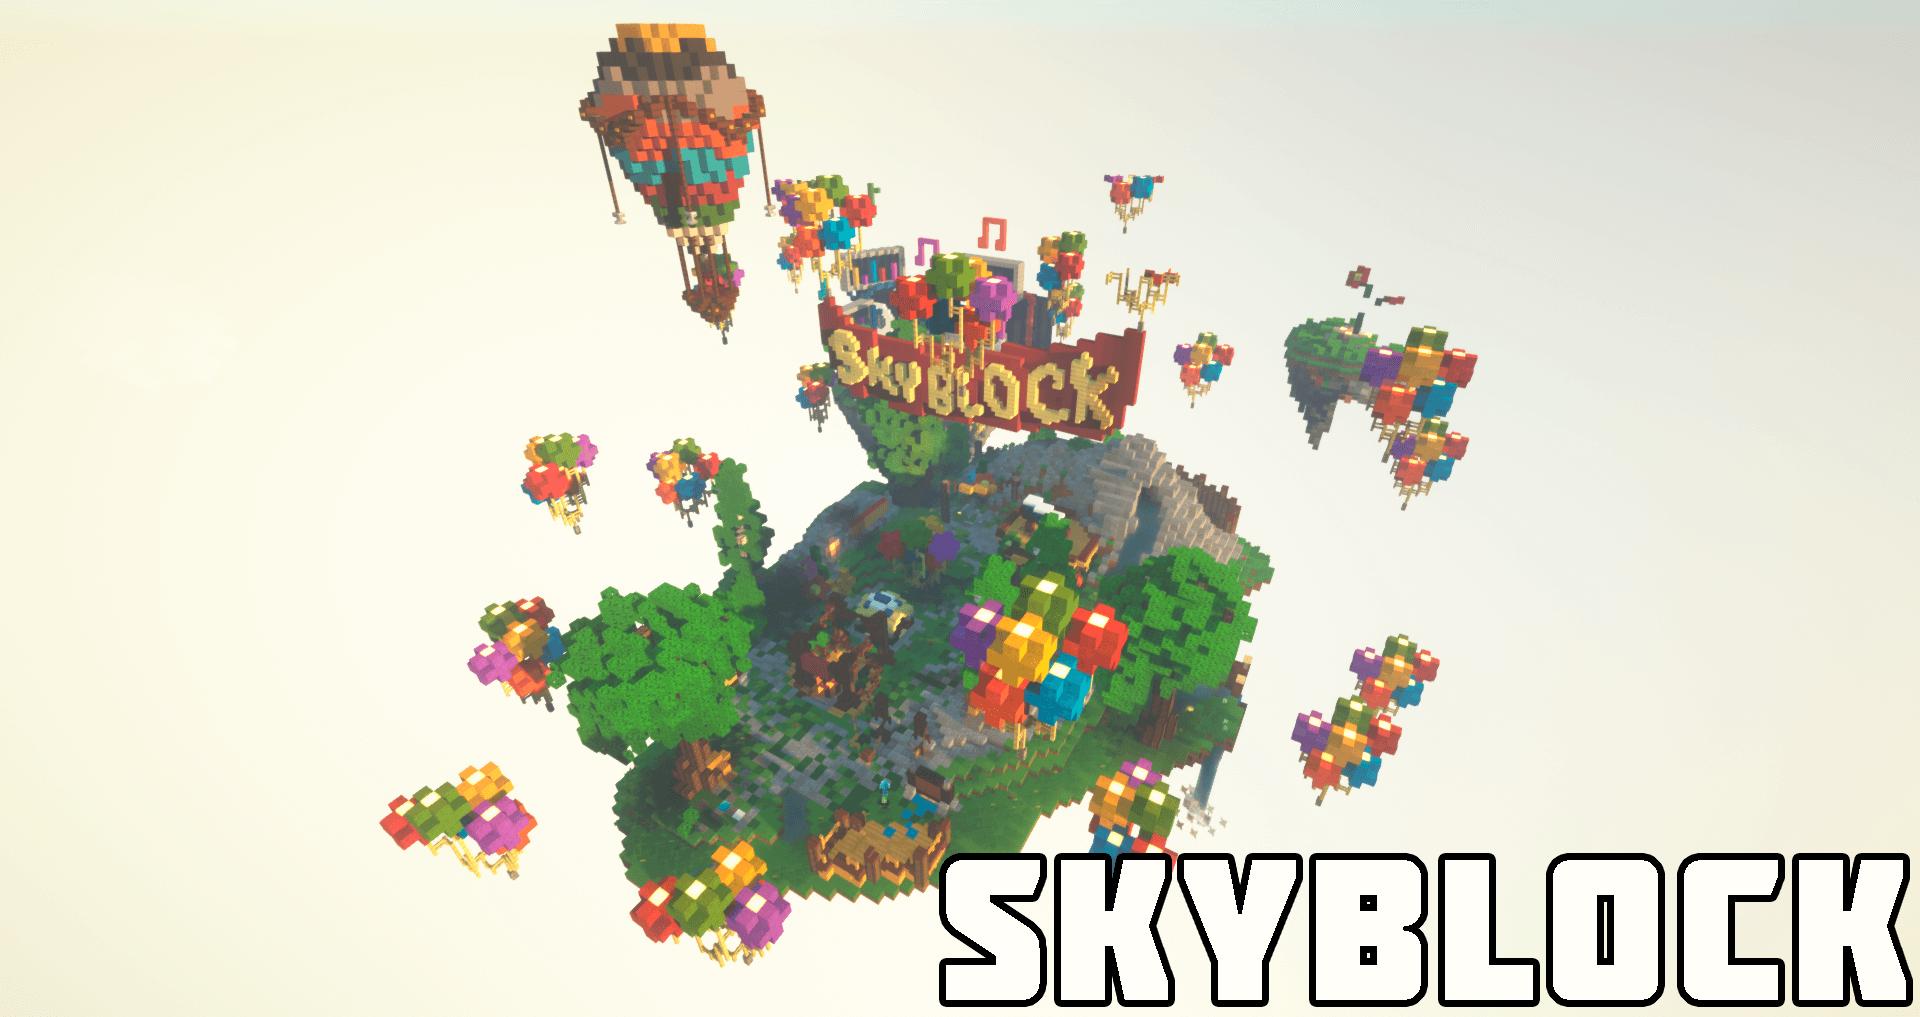 skyblockportada.png